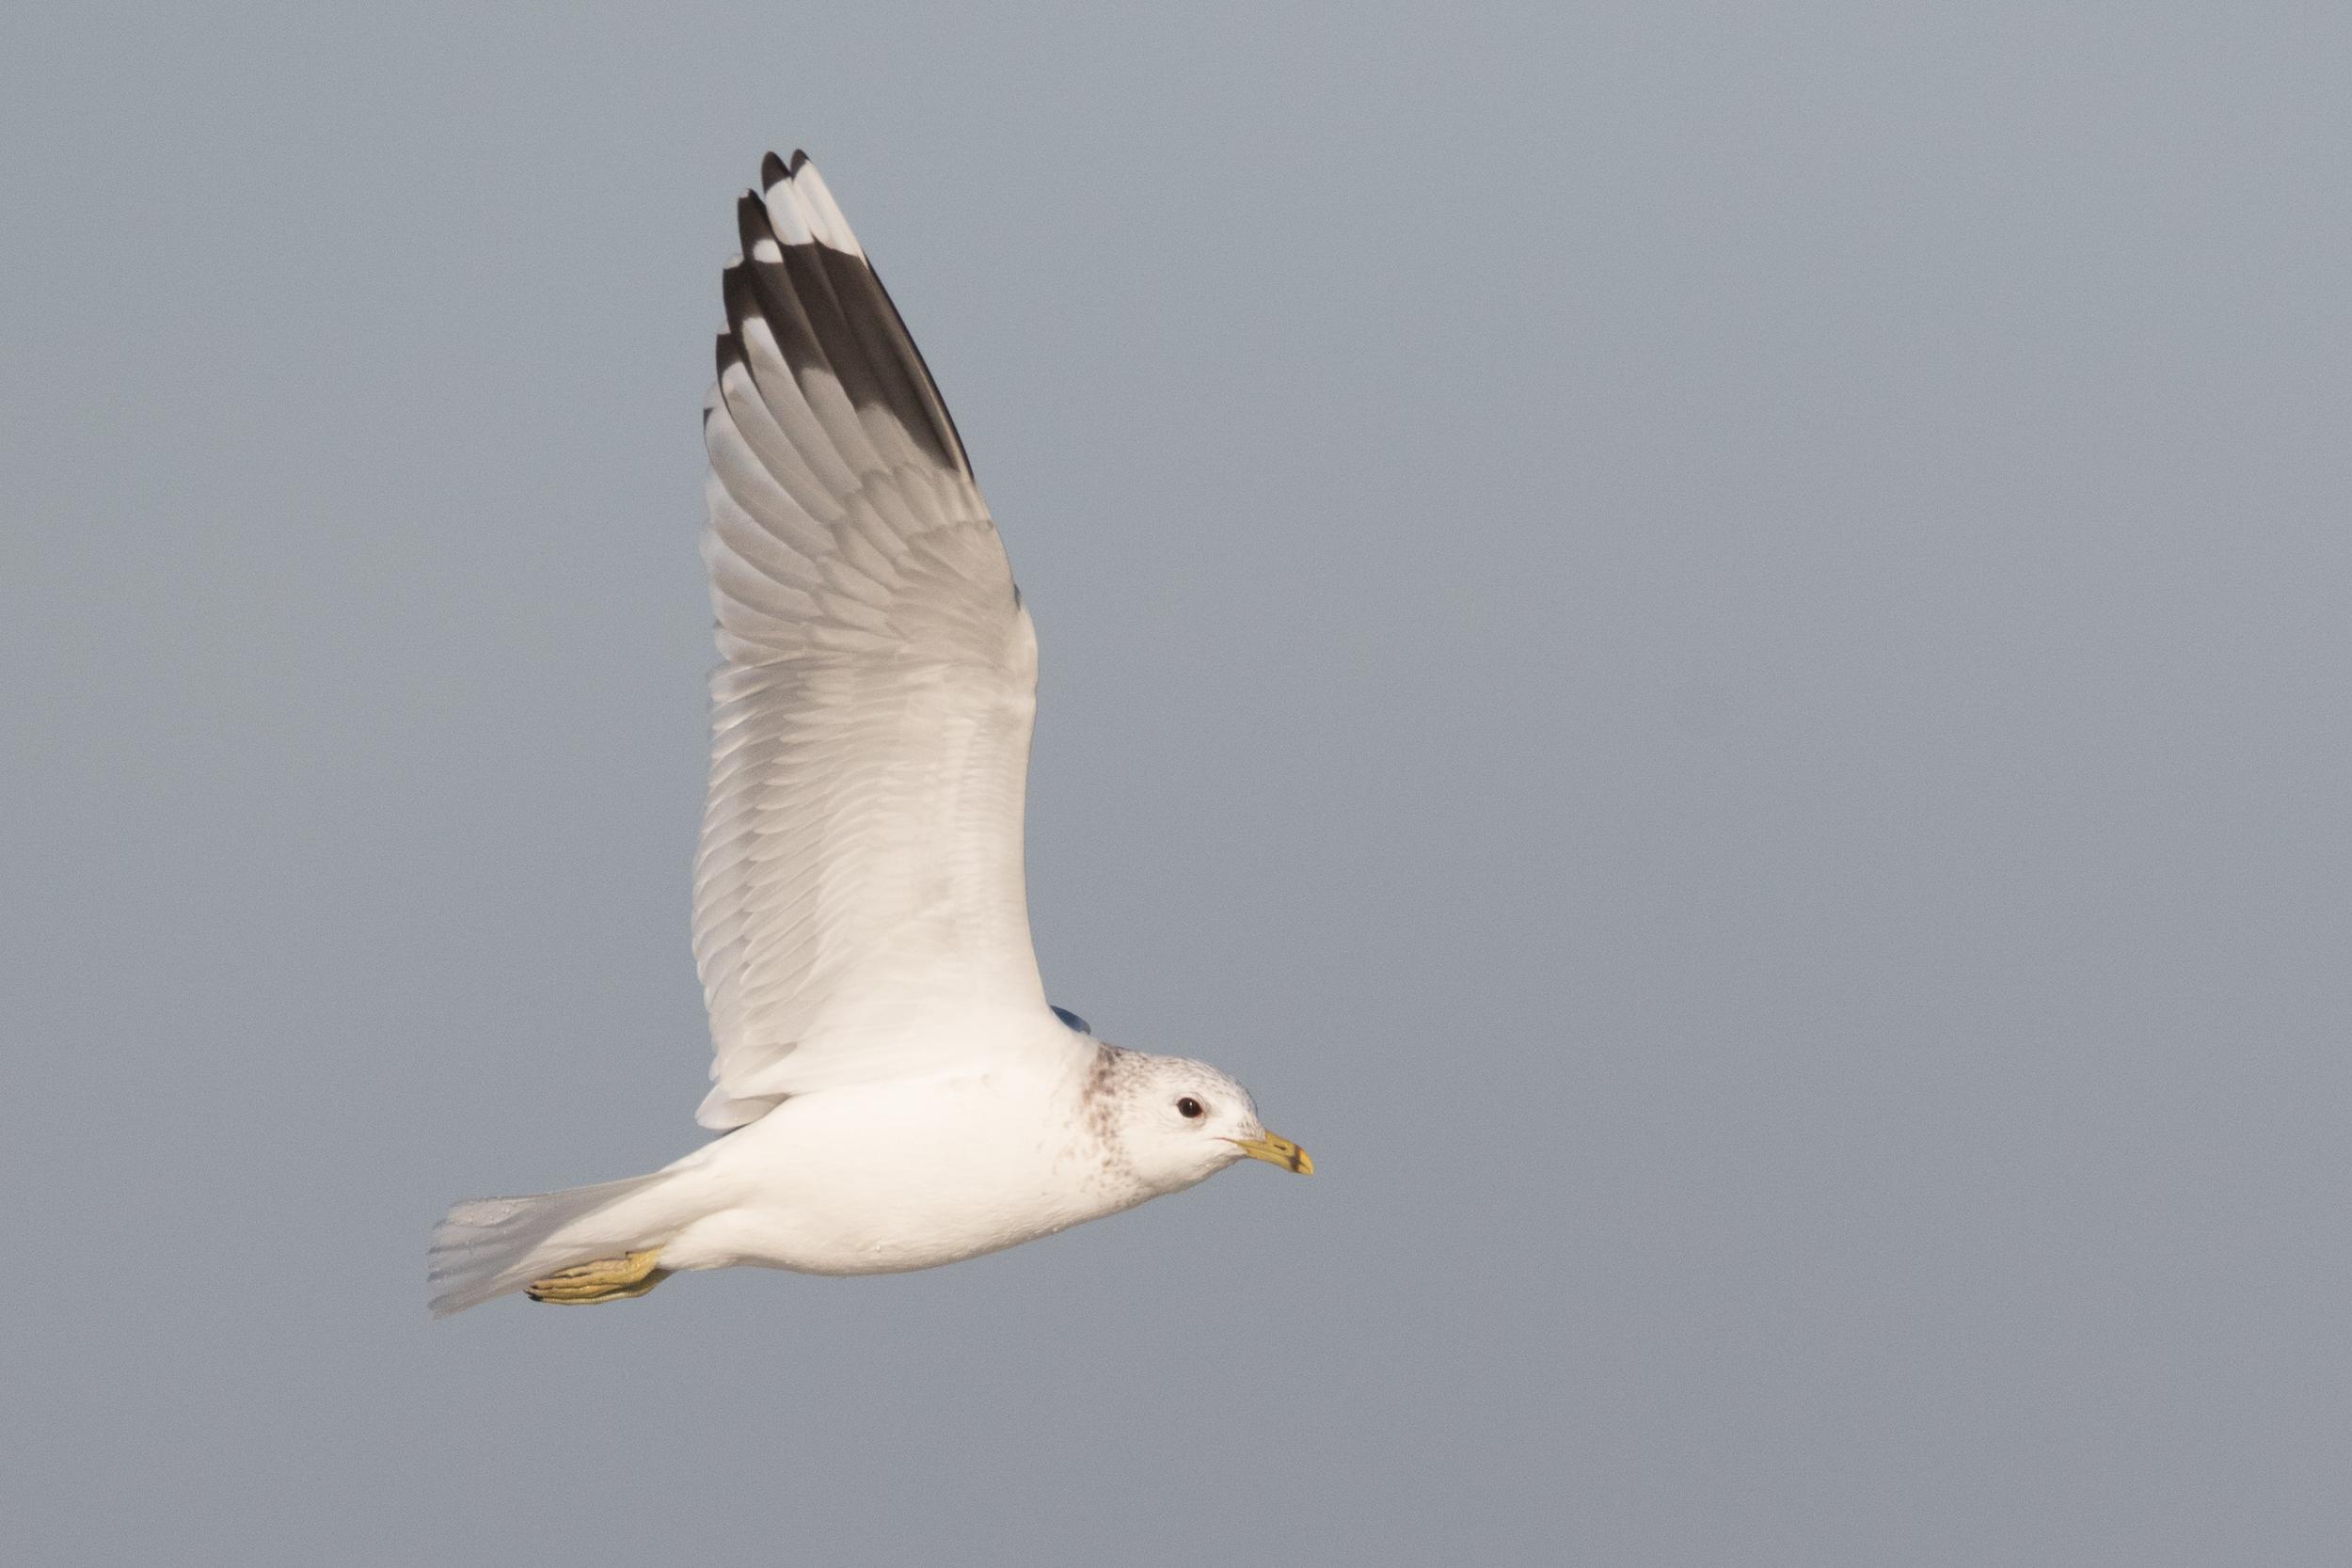 20170121-Common Gull Adult-88.jpg